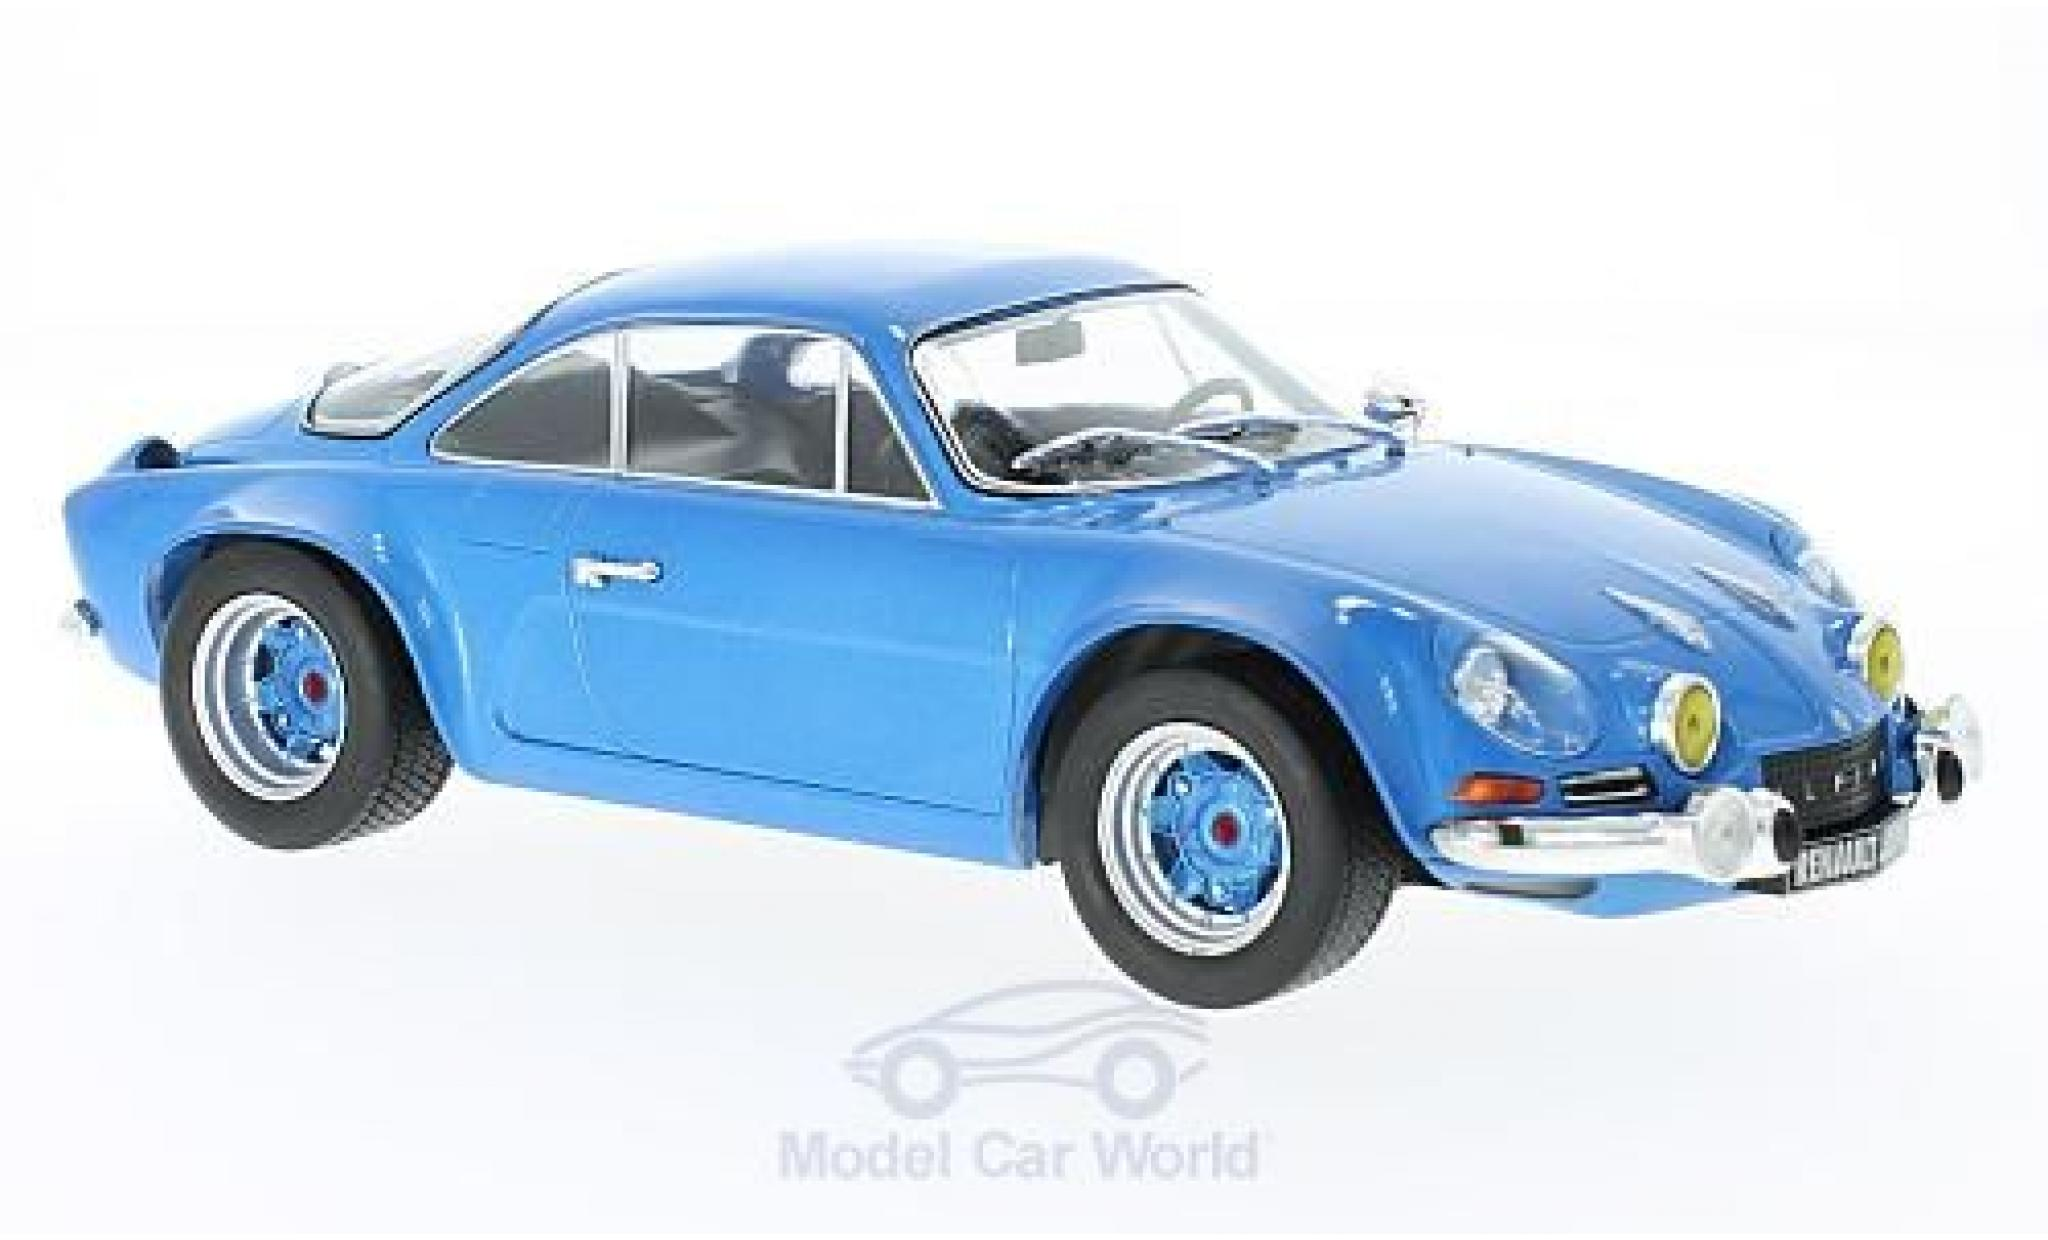 Alpine A110 1/18 IXO Renault A 110 blue 1973